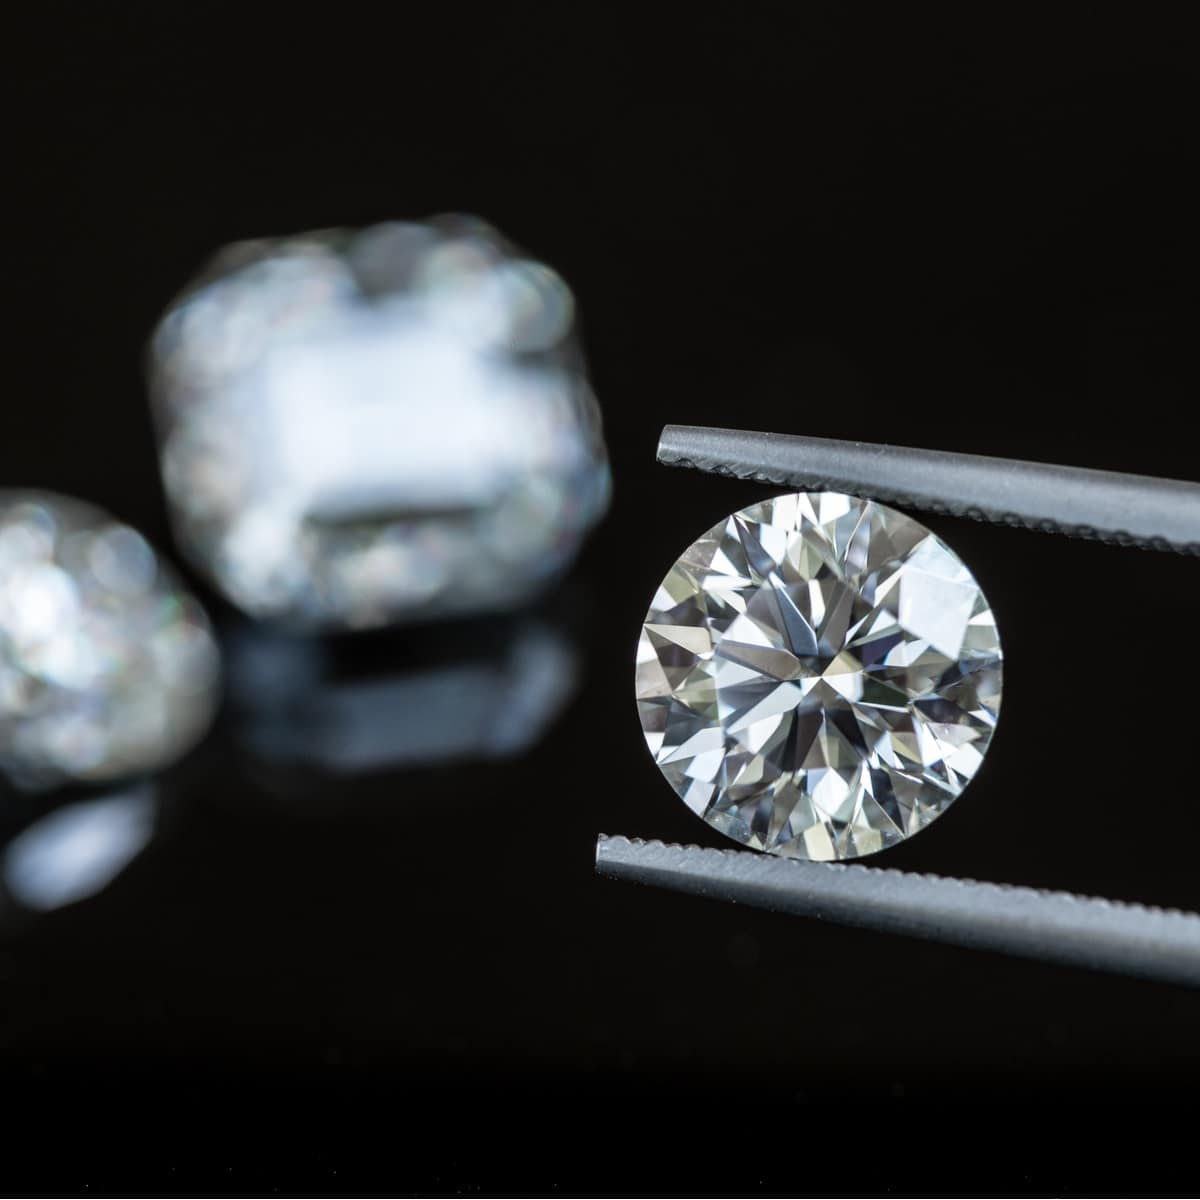 K. Alan Smith Lab Grown Diamond Blog